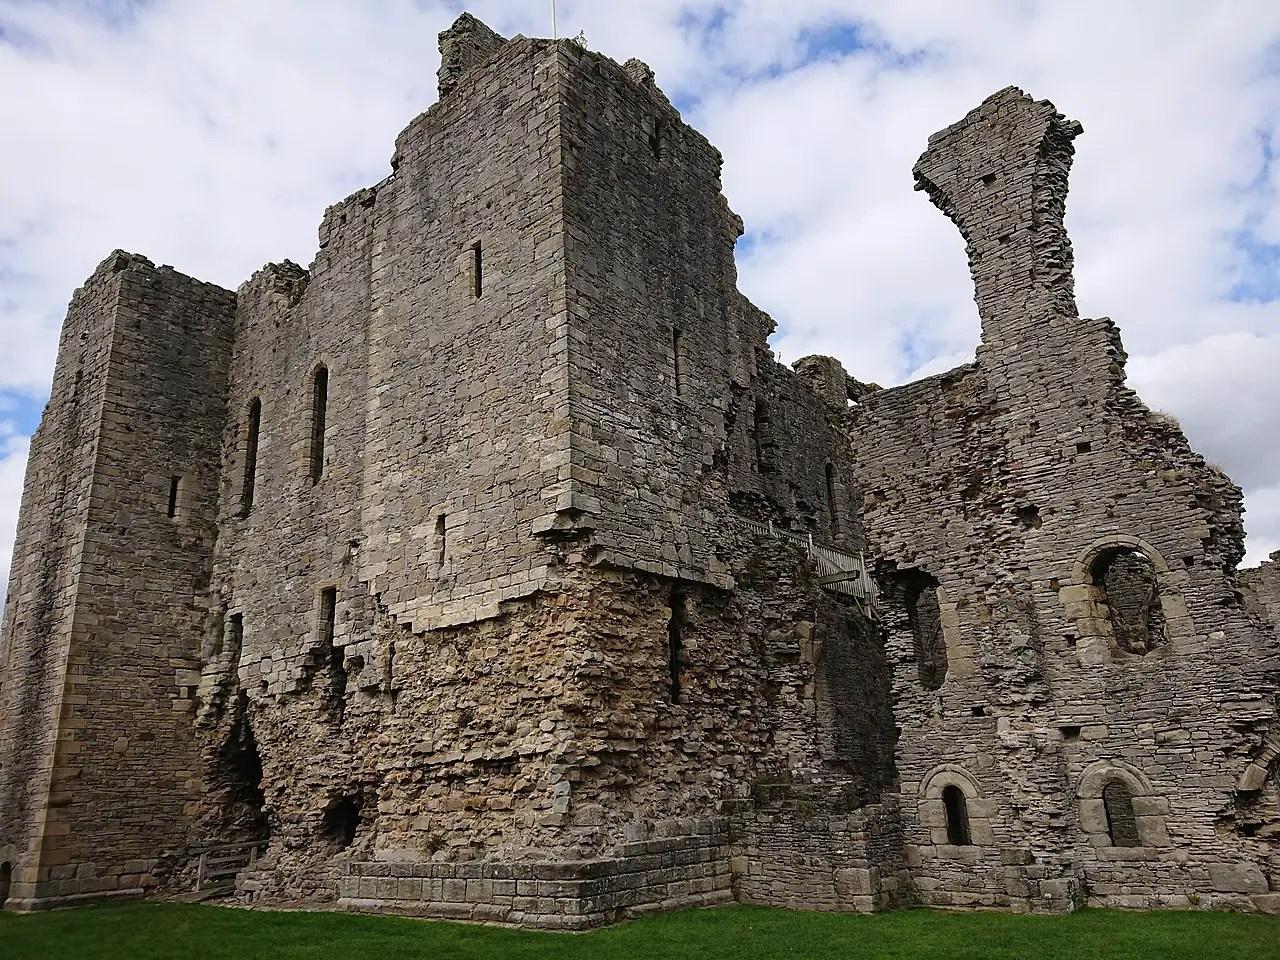 Ruined castle walls